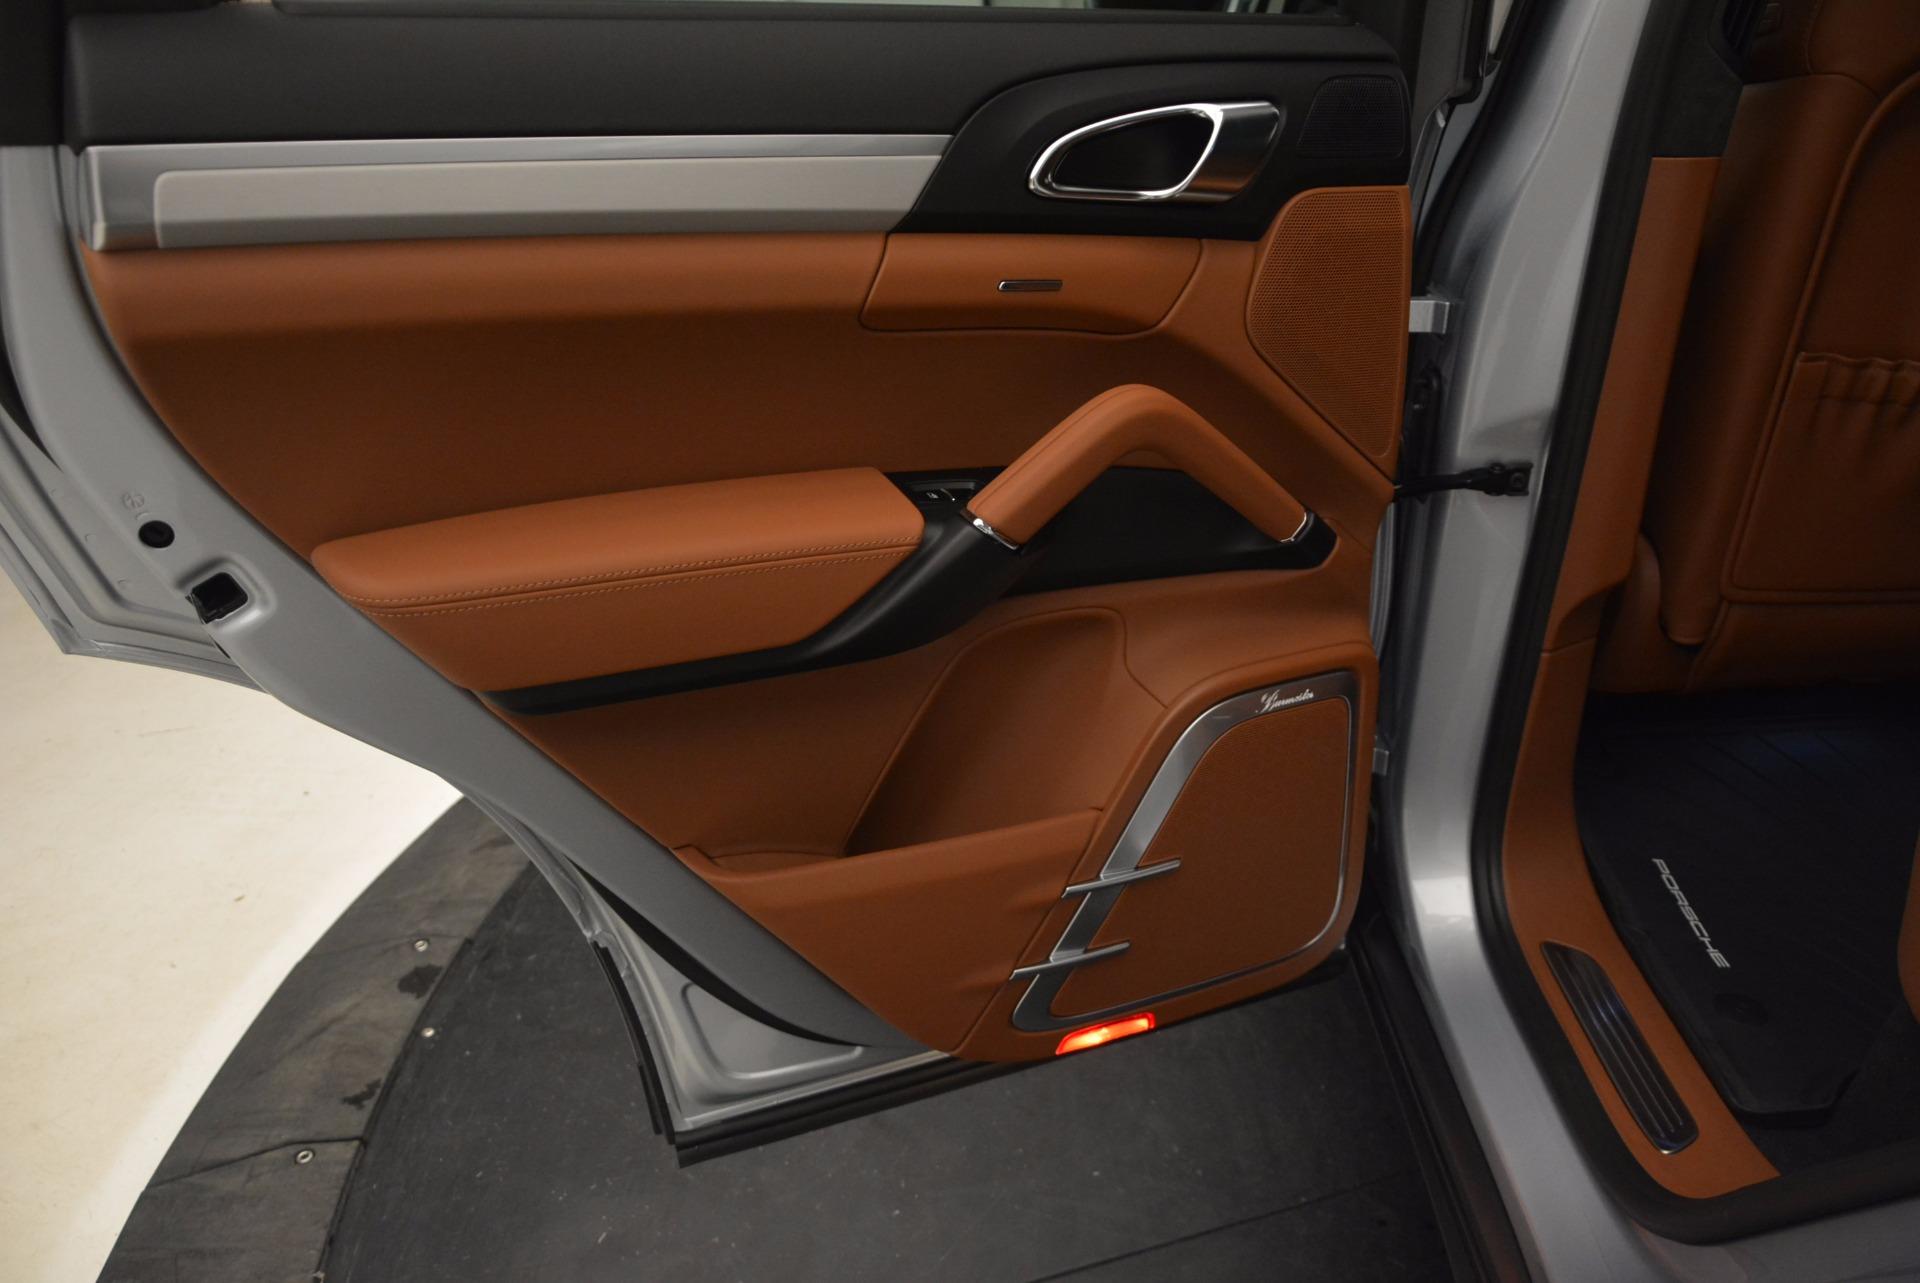 Used 2016 Porsche Cayenne Turbo For Sale In Greenwich, CT. Alfa Romeo of Greenwich, 7165 1000_p24